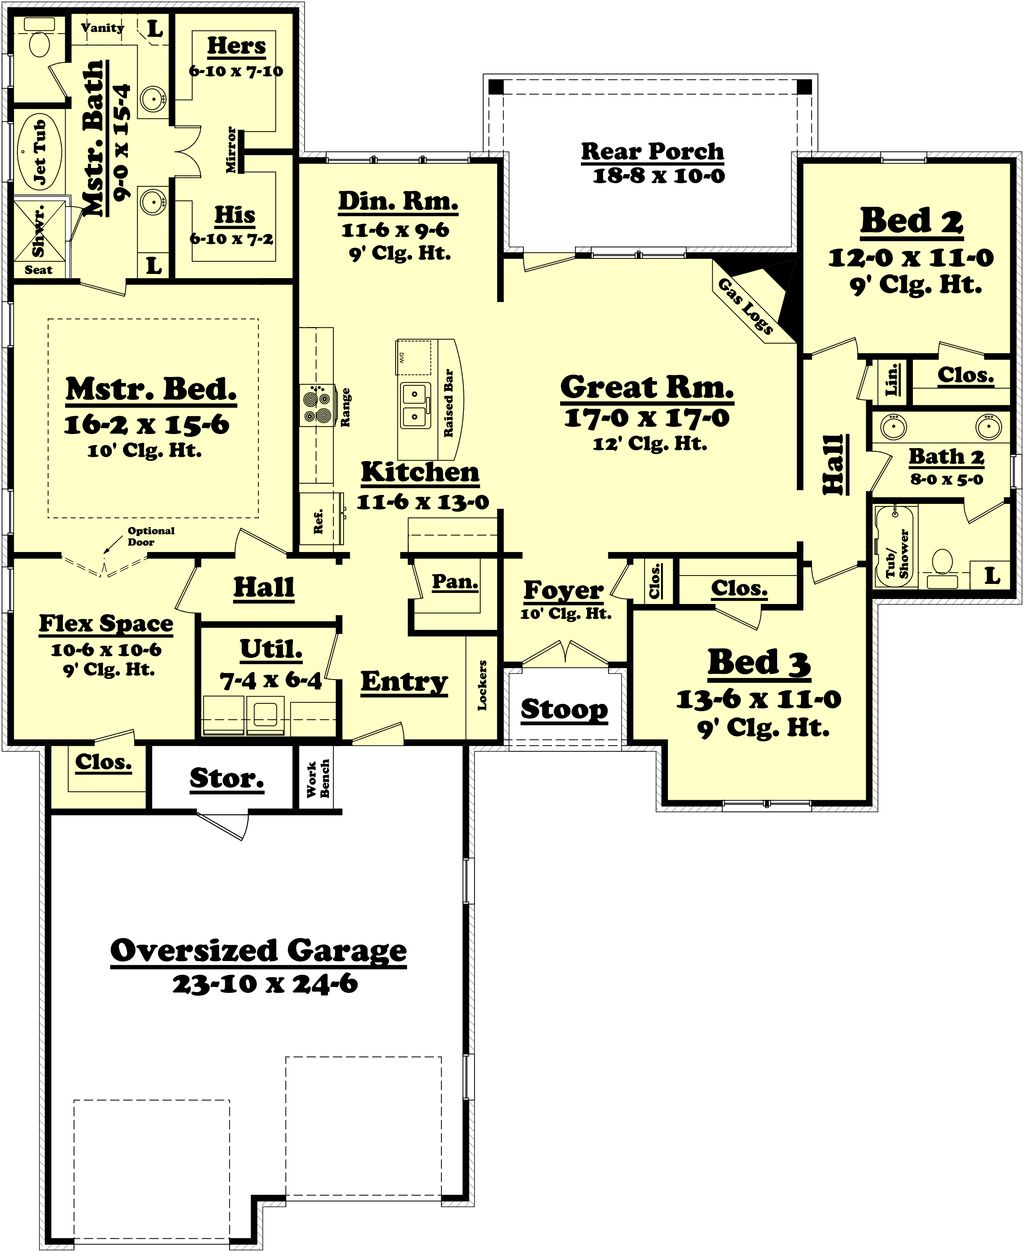 European Style House Plan 3 Beds 2 Baths 2000 Sq Ft Plan 430 73 Brick House Plans Ranch Style House Plans Ranch House Plans